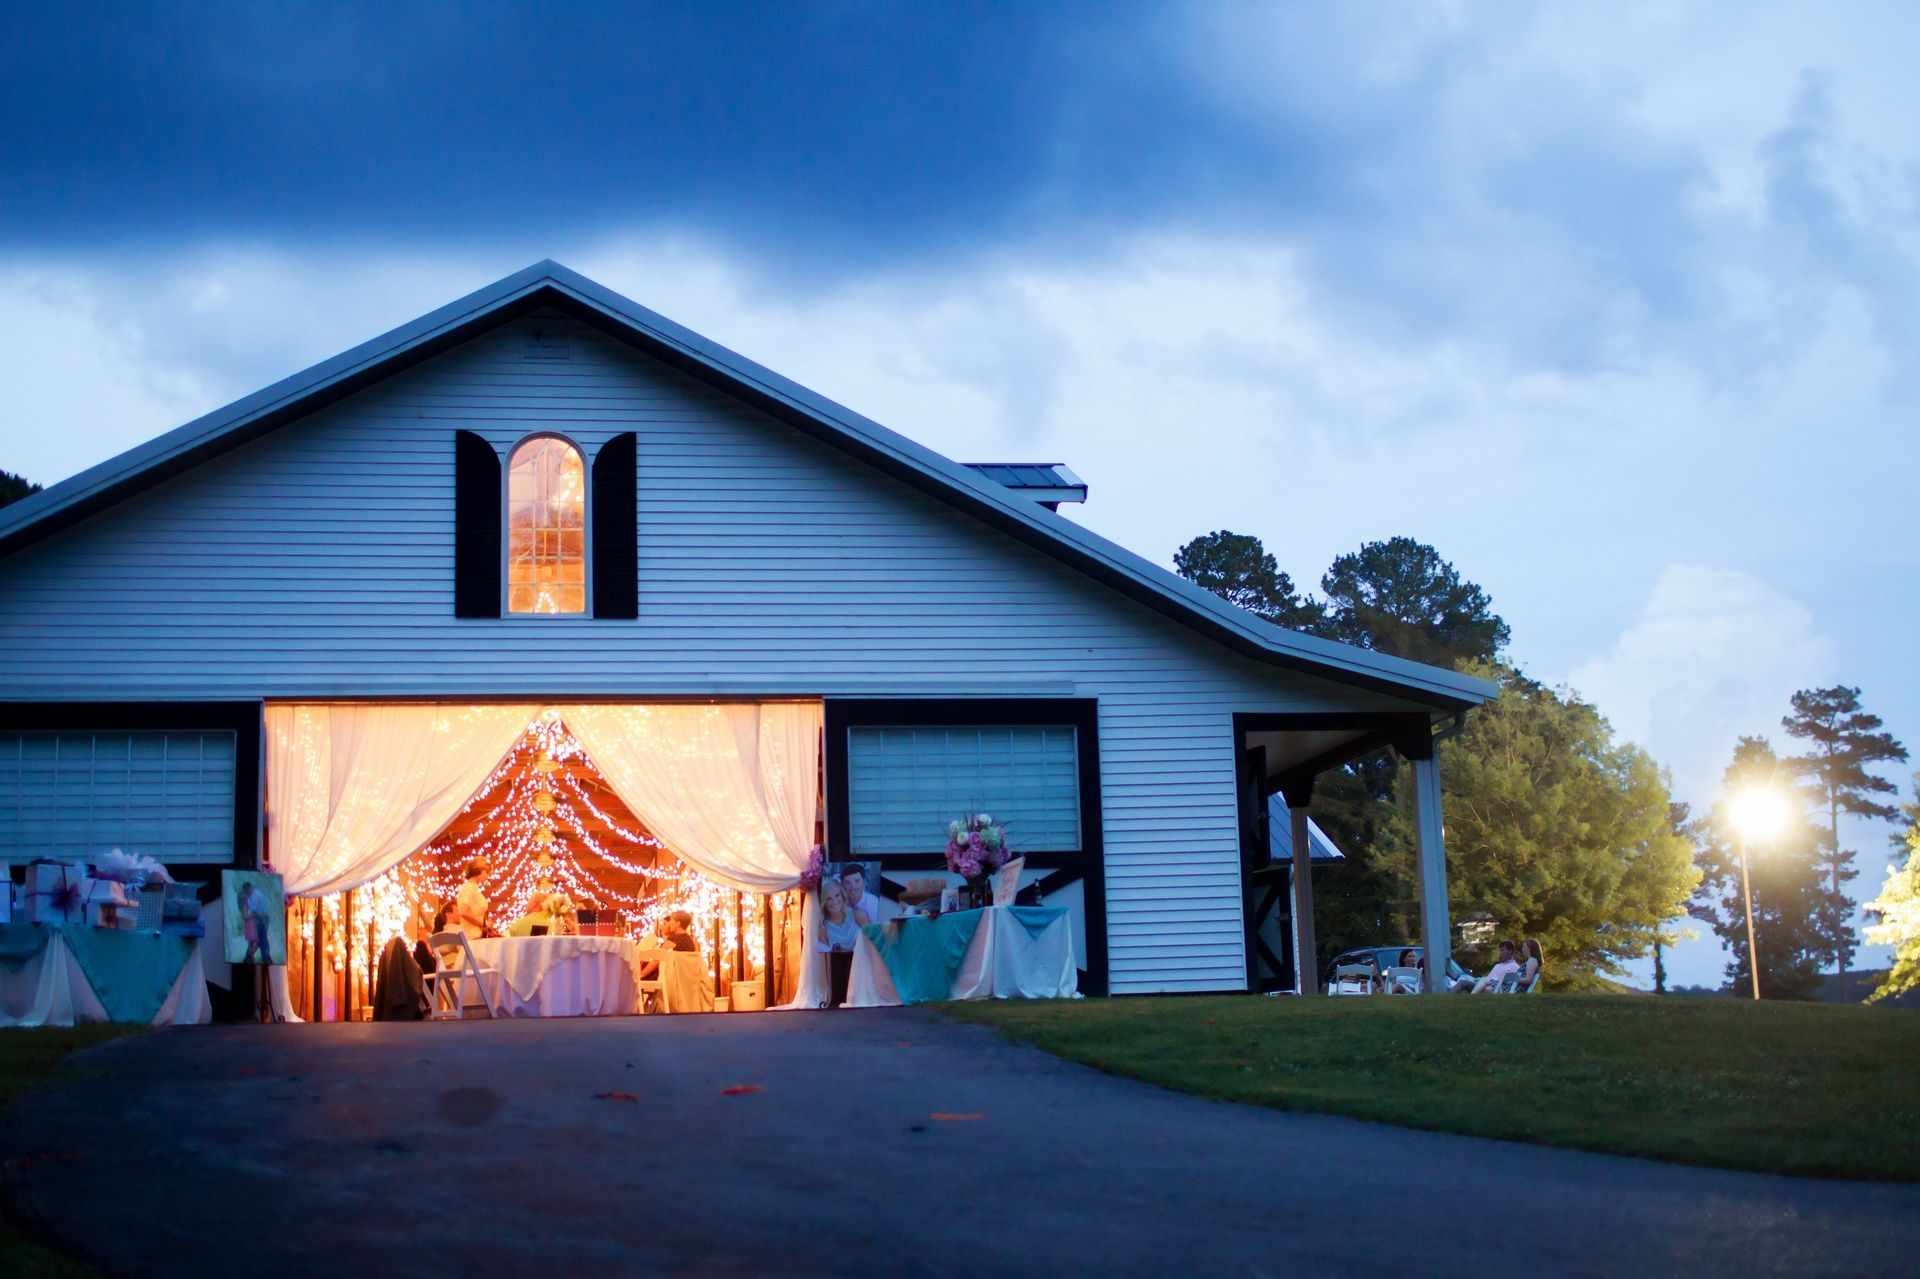 Antebellum weddings at oak island alabama wedding venues antebellum weddings at oak island alabama wedding venues oakislandweddin junglespirit Choice Image